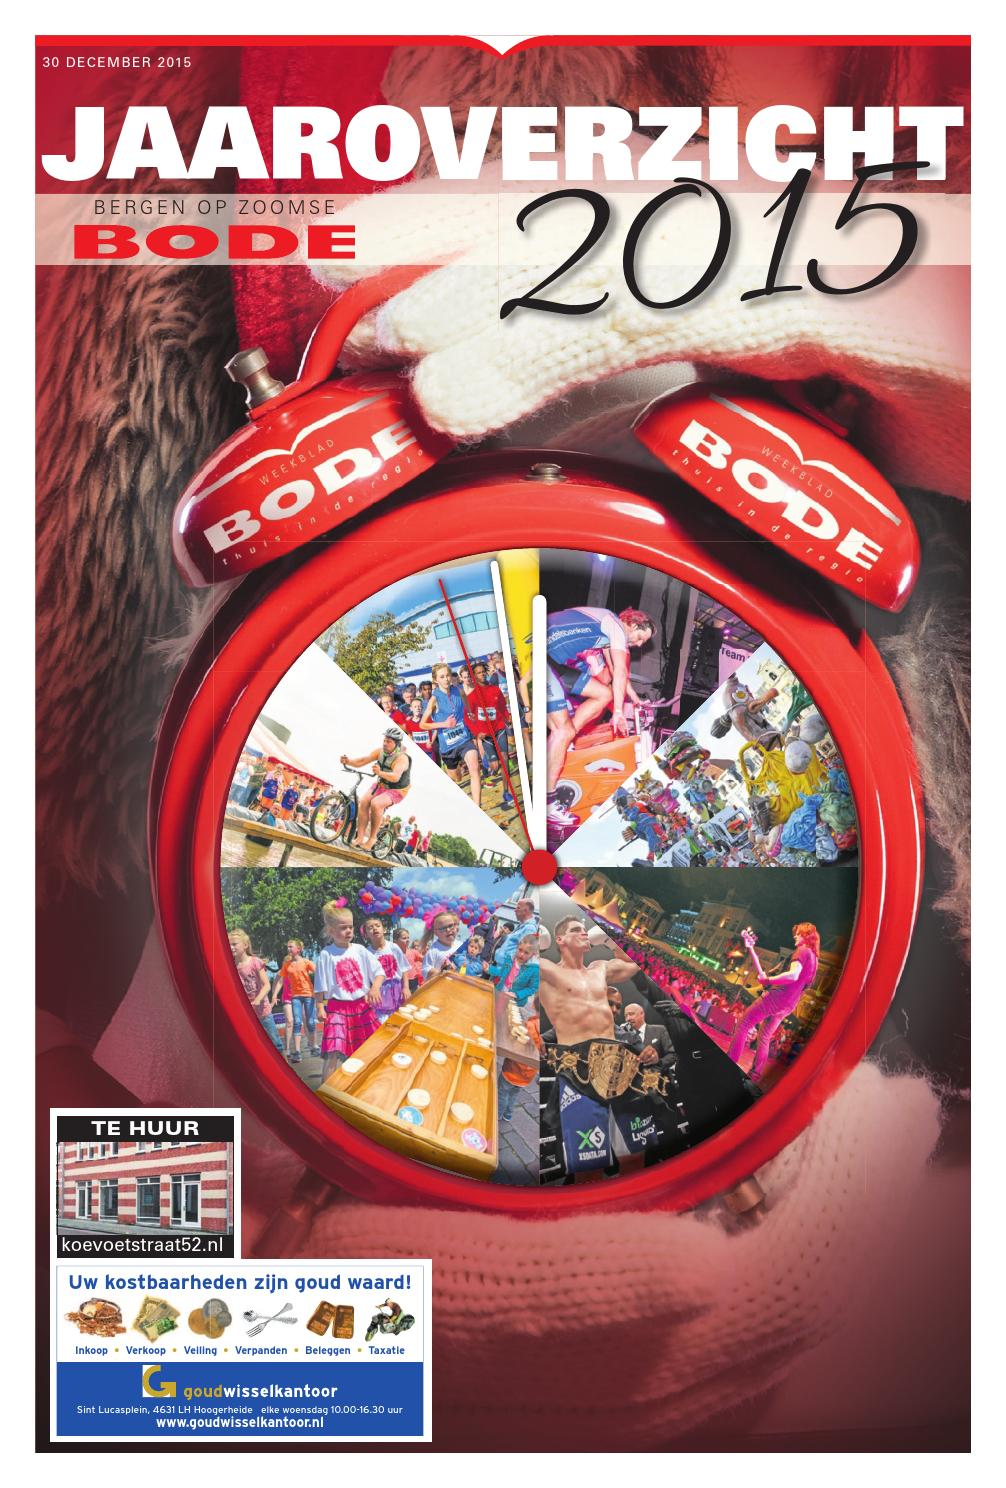 b5c2ef9a4c3f9b Bergen op Zoomse Bode 30-12-2015 by Uitgeverij de Bode - issuu